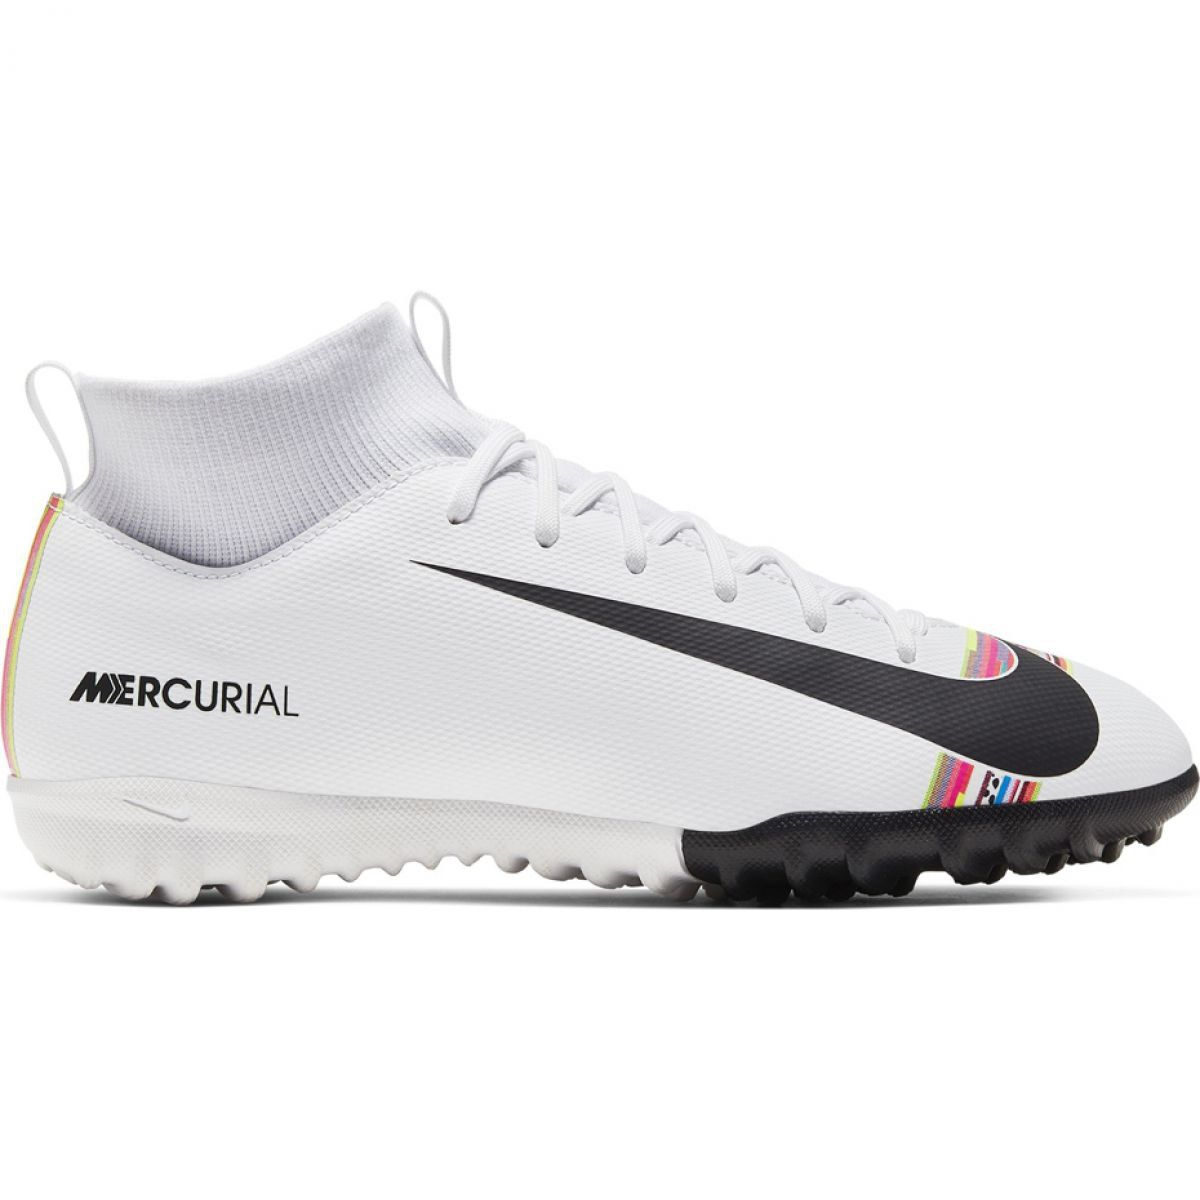 Buty Pilkarskie Nike Mercurial Superfly X 6 Academy Tf Jr Aj3112 109 Biale Wielokolorowe Astro Turf Trainers Football Boots Football Boots Astro